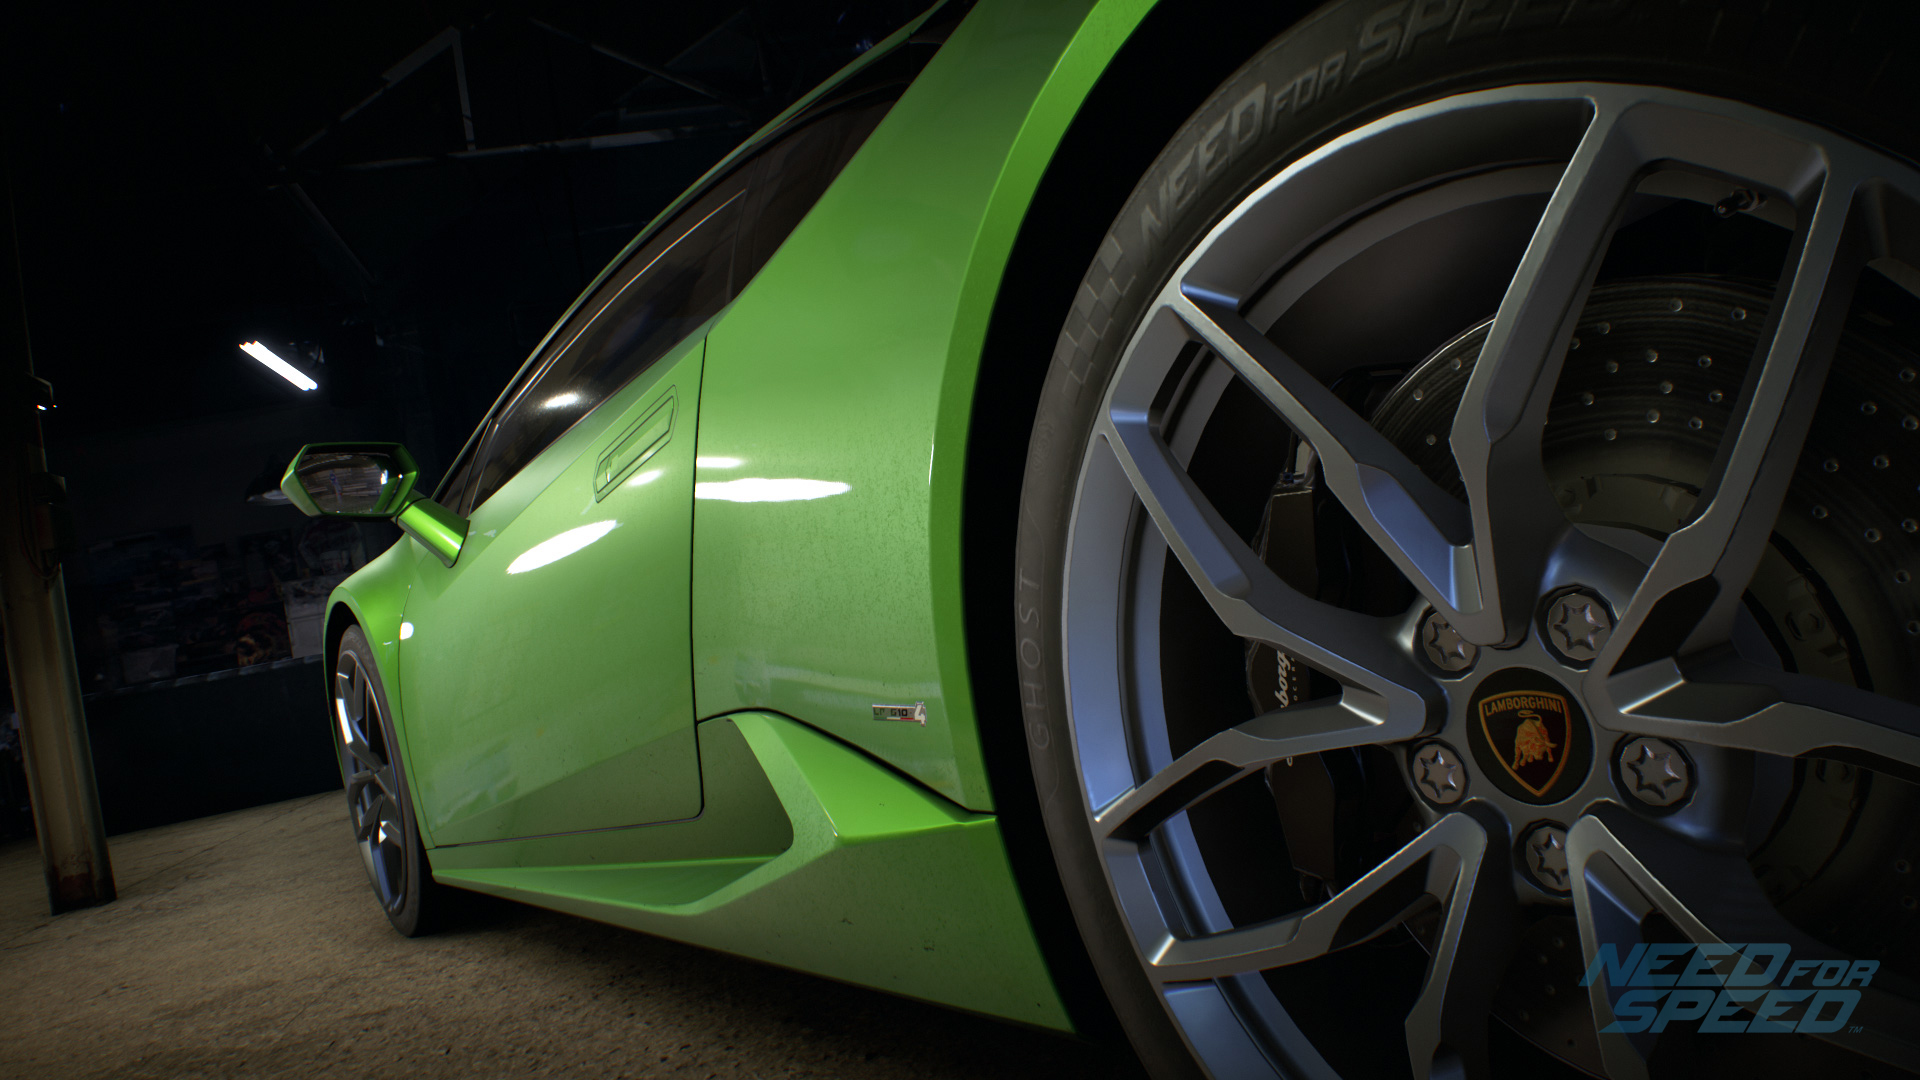 642604 Extraordinary Lamborghini Huracan Need for Speed Cars Trend